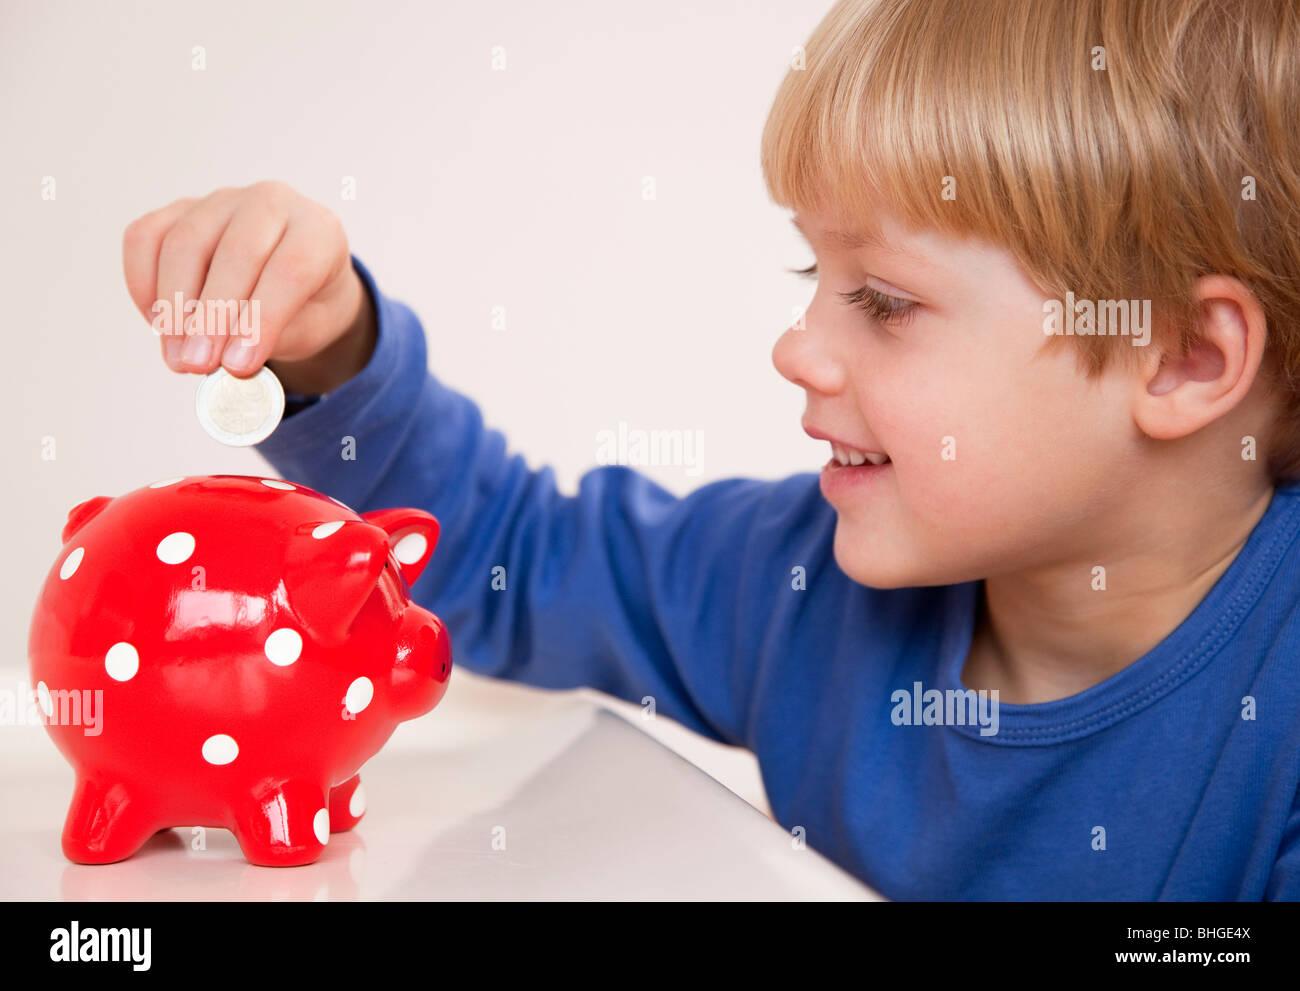 boy saving money - Stock Image